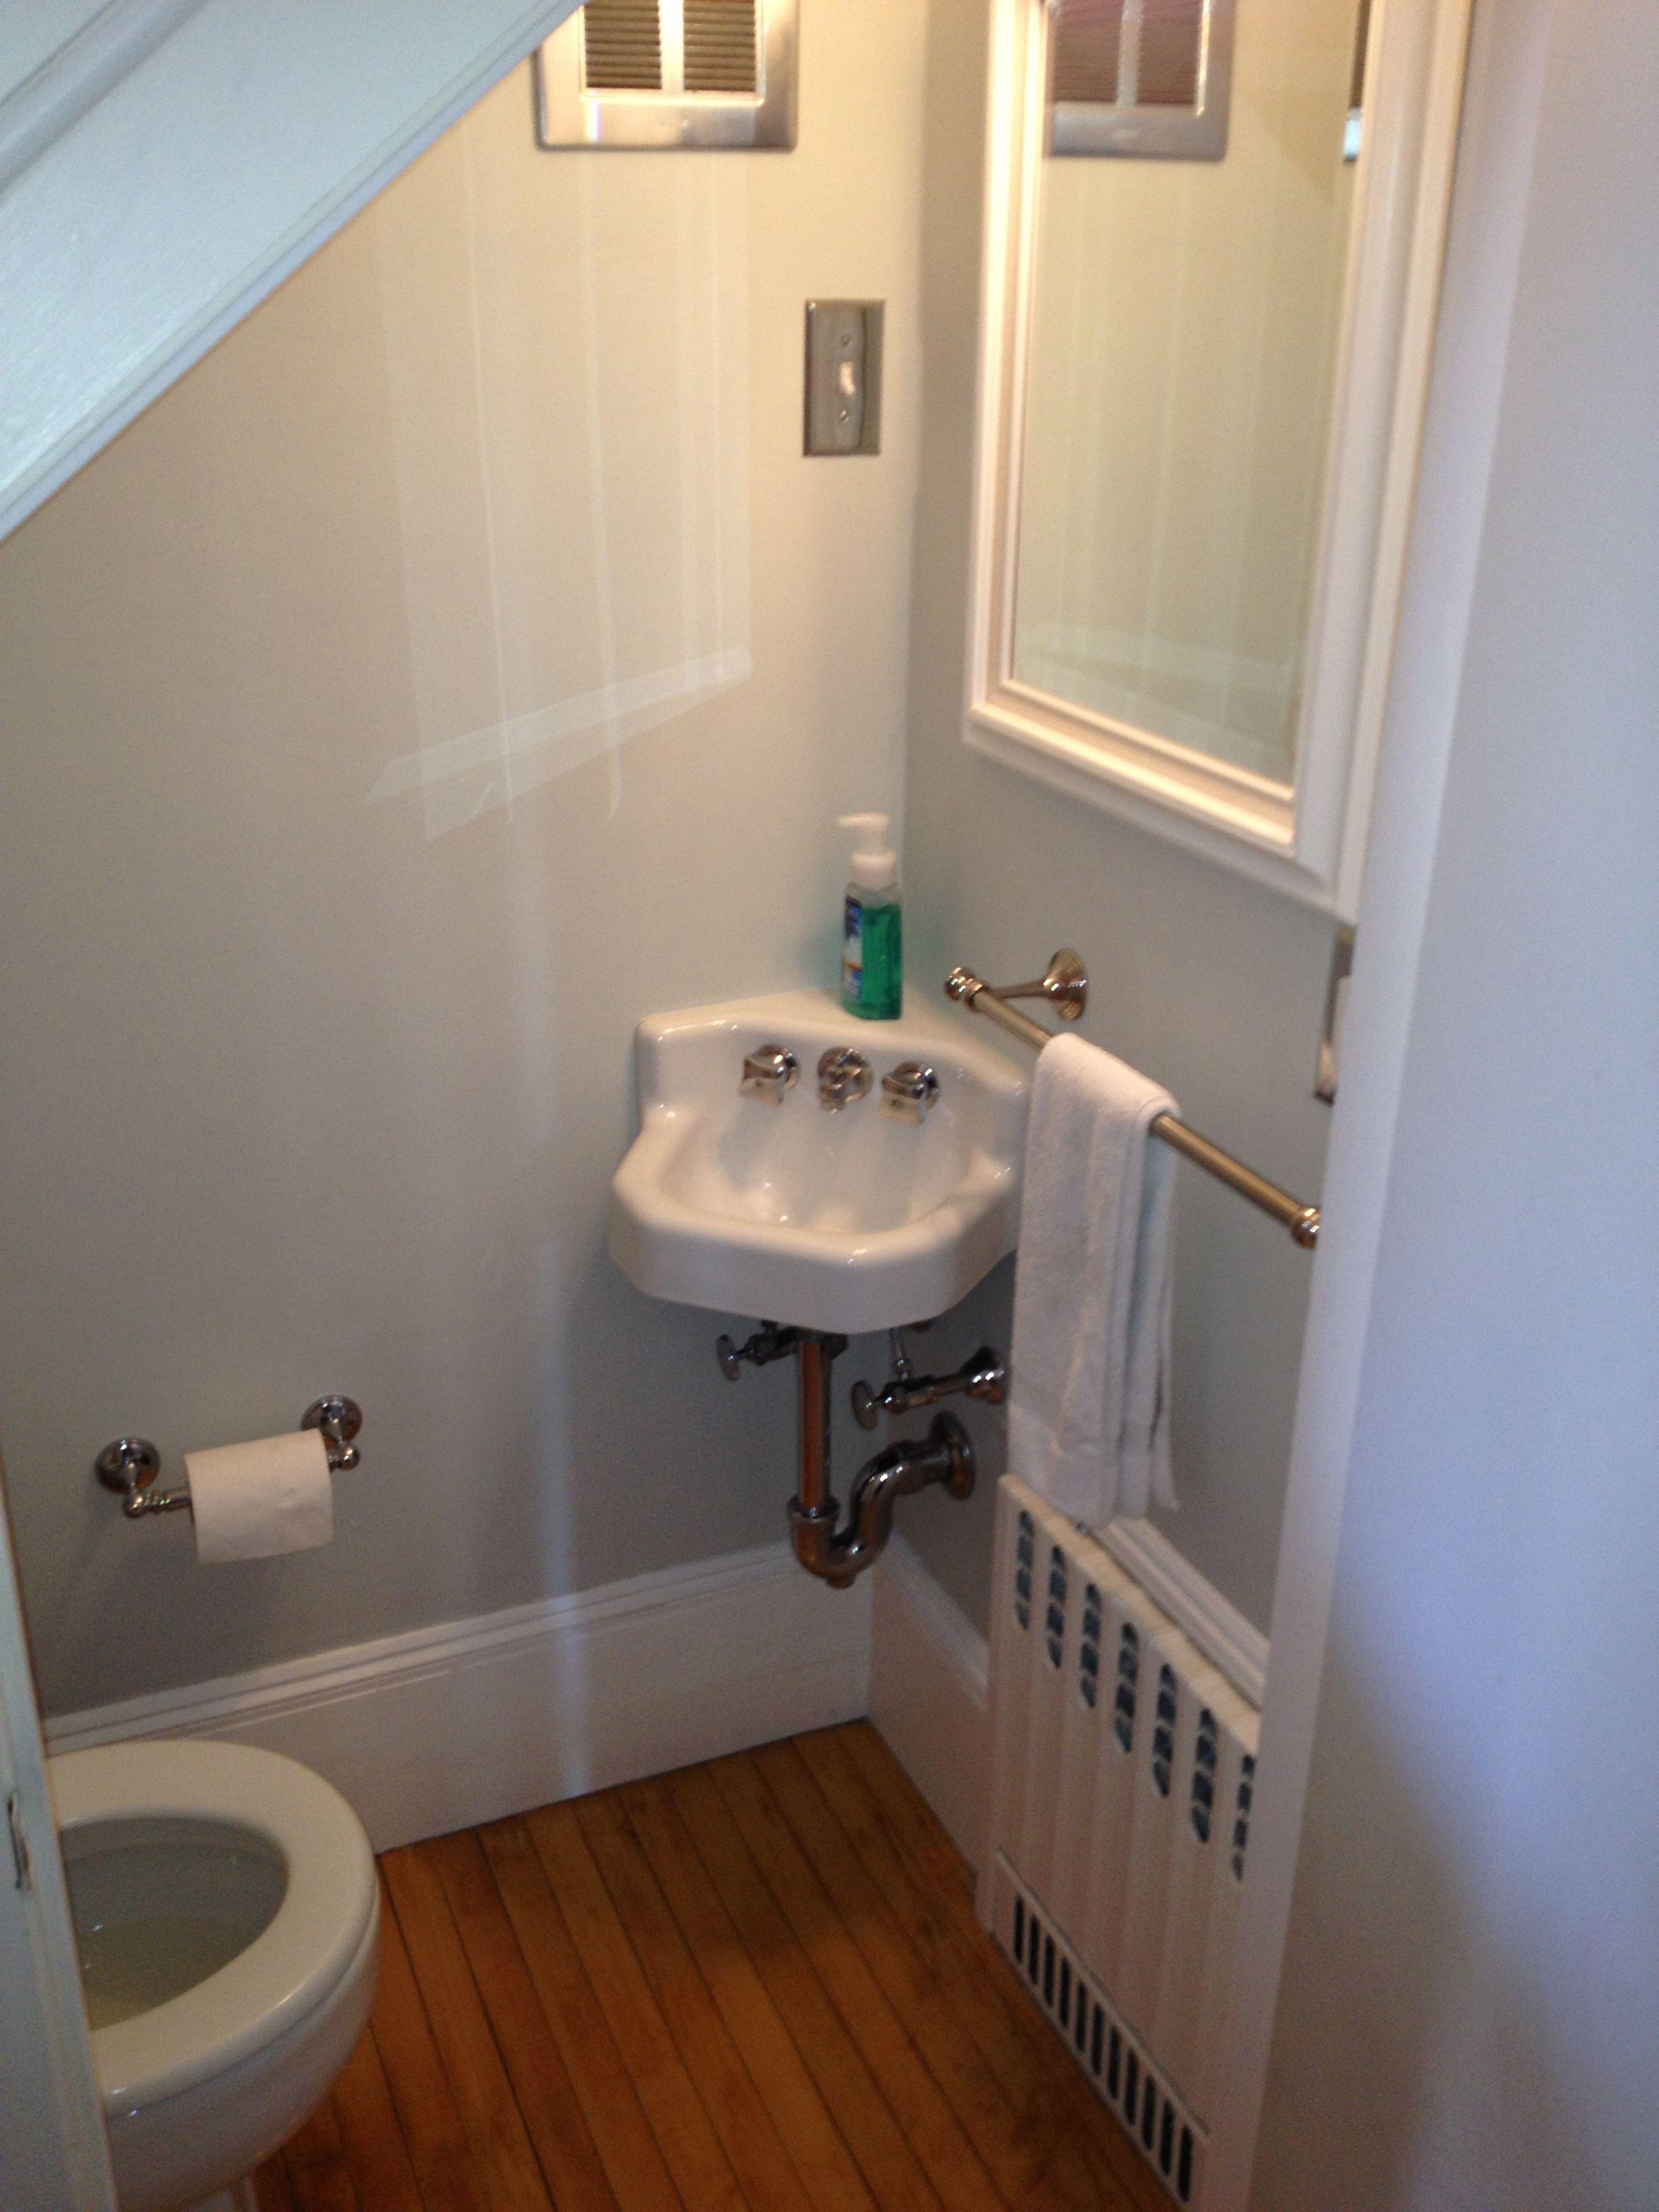 Modern Minimalist Half Bath Decorating Ideas With Small Shelves In